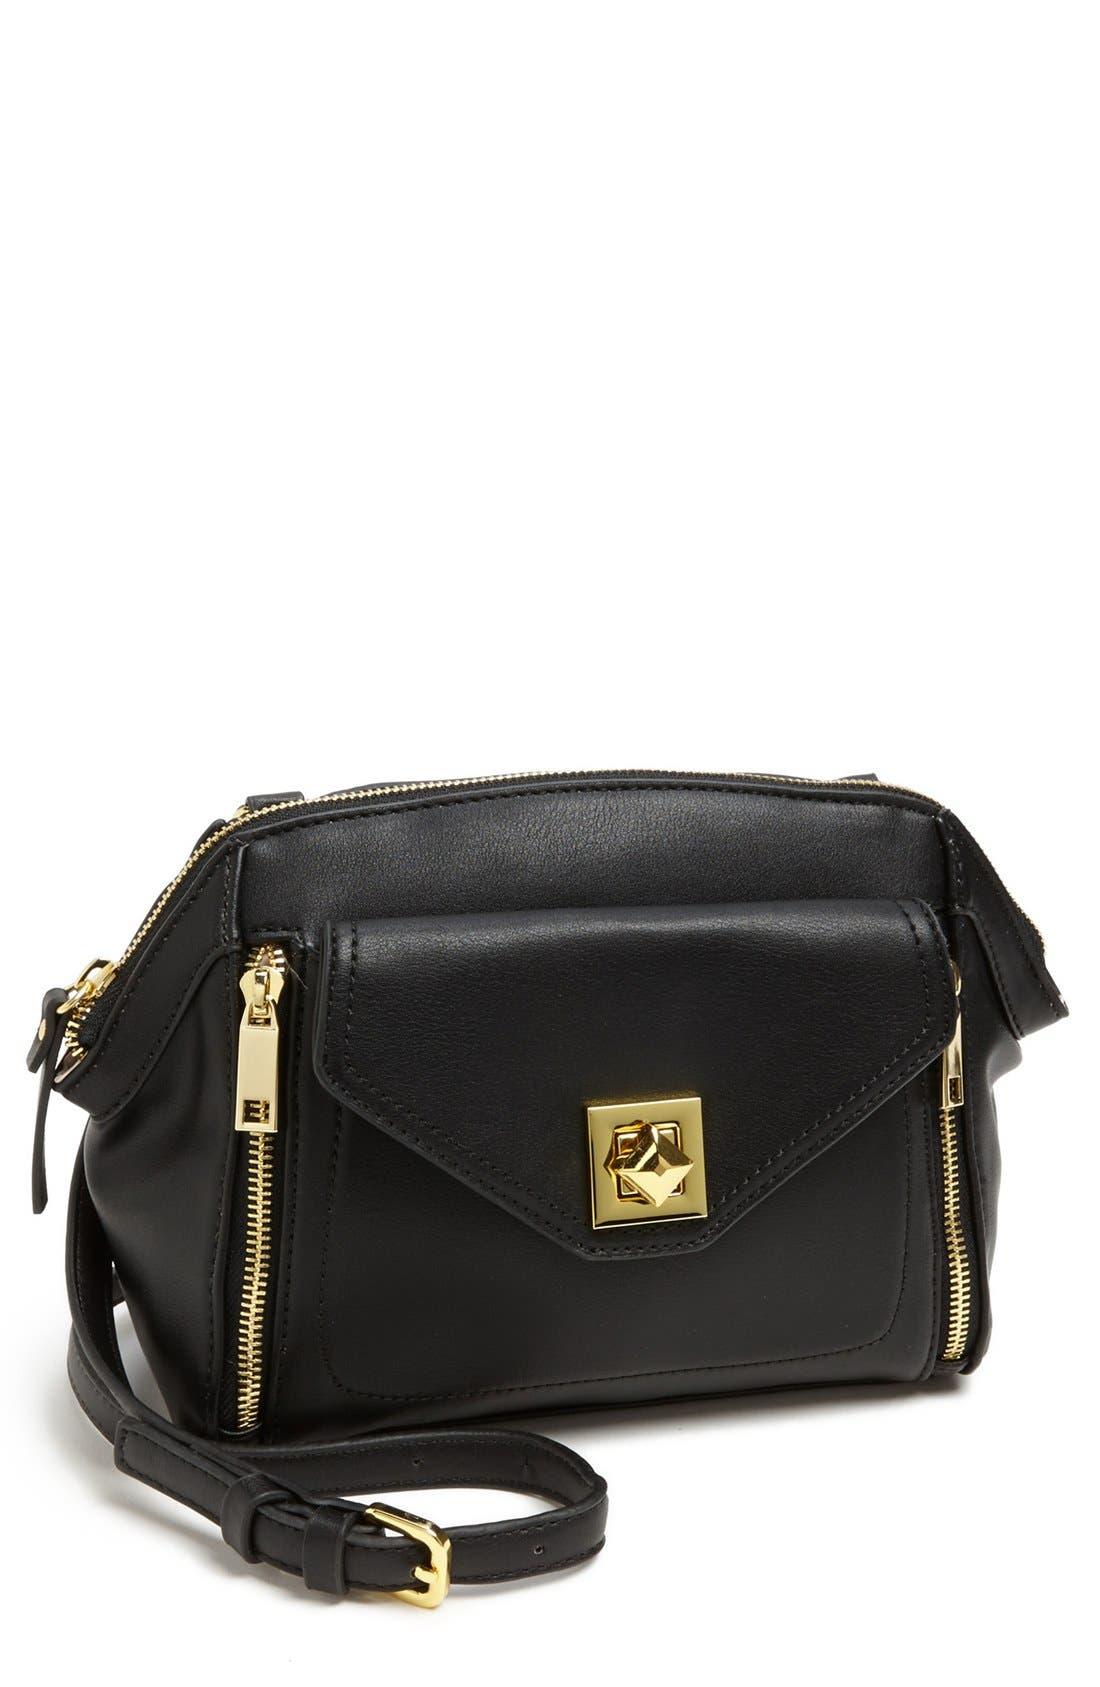 Main Image - Jessica Simpson 'Hadley' Crossbody Bag